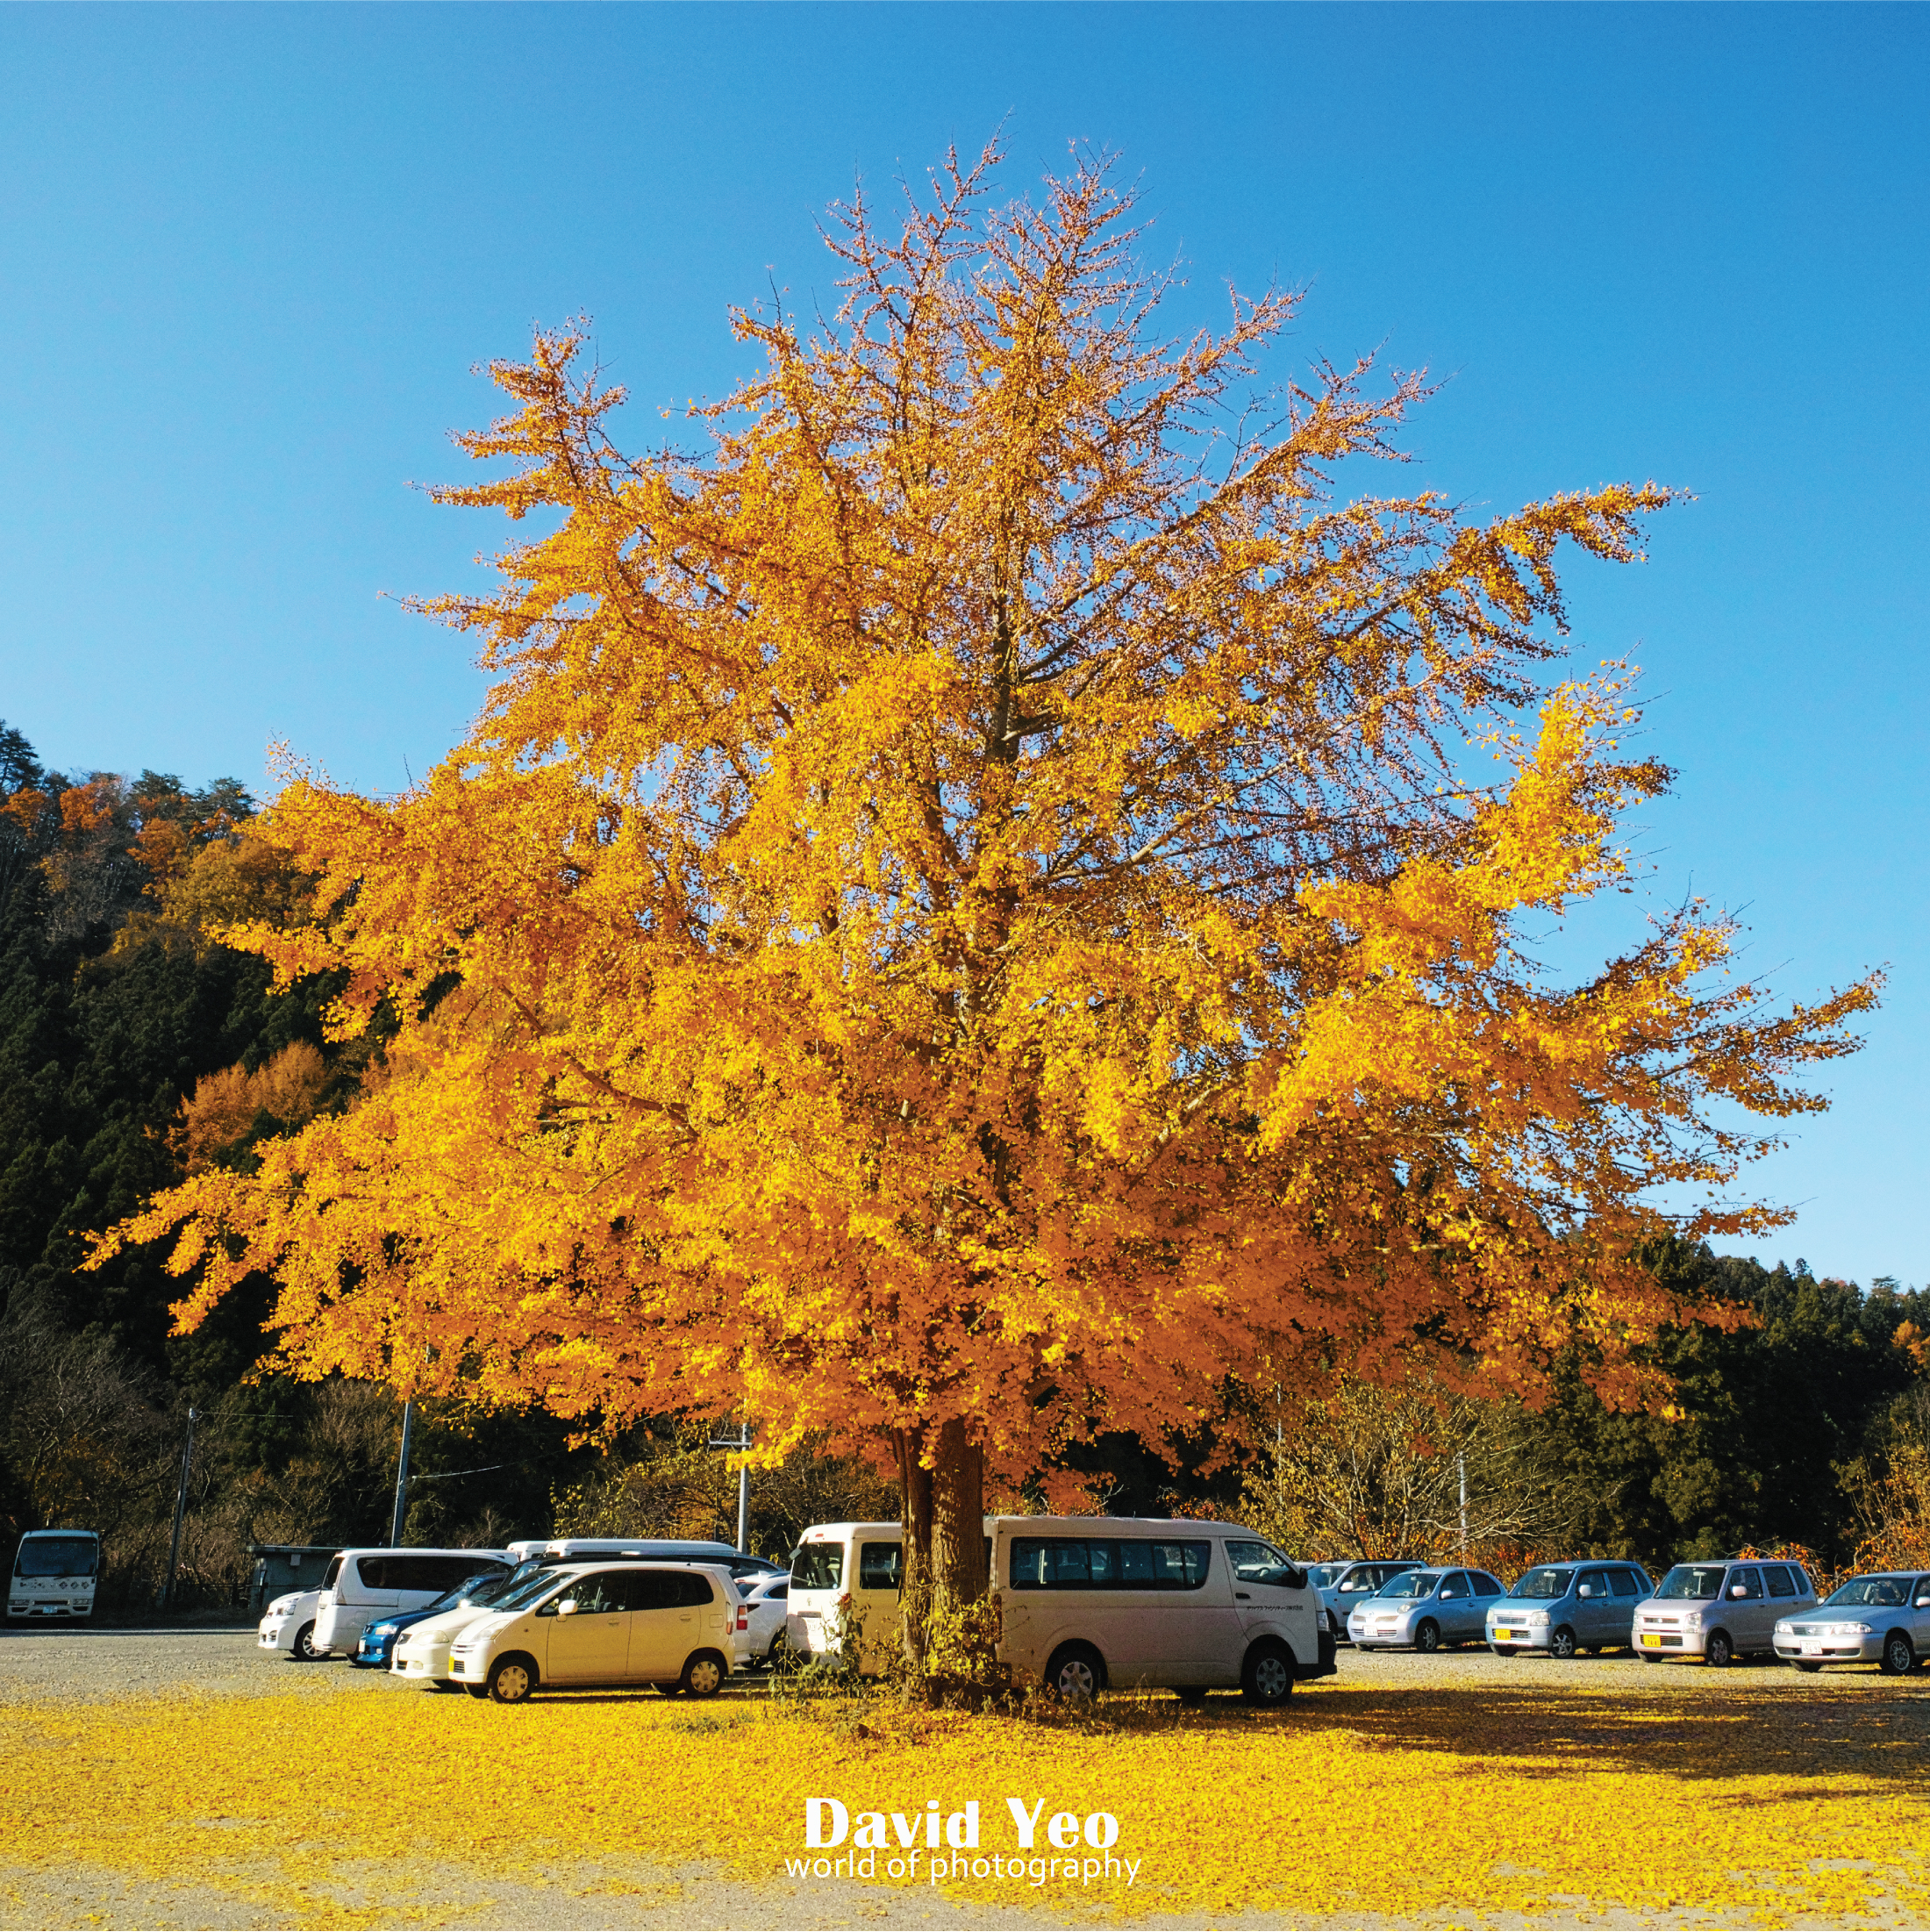 Golden Tree Photo Gallery